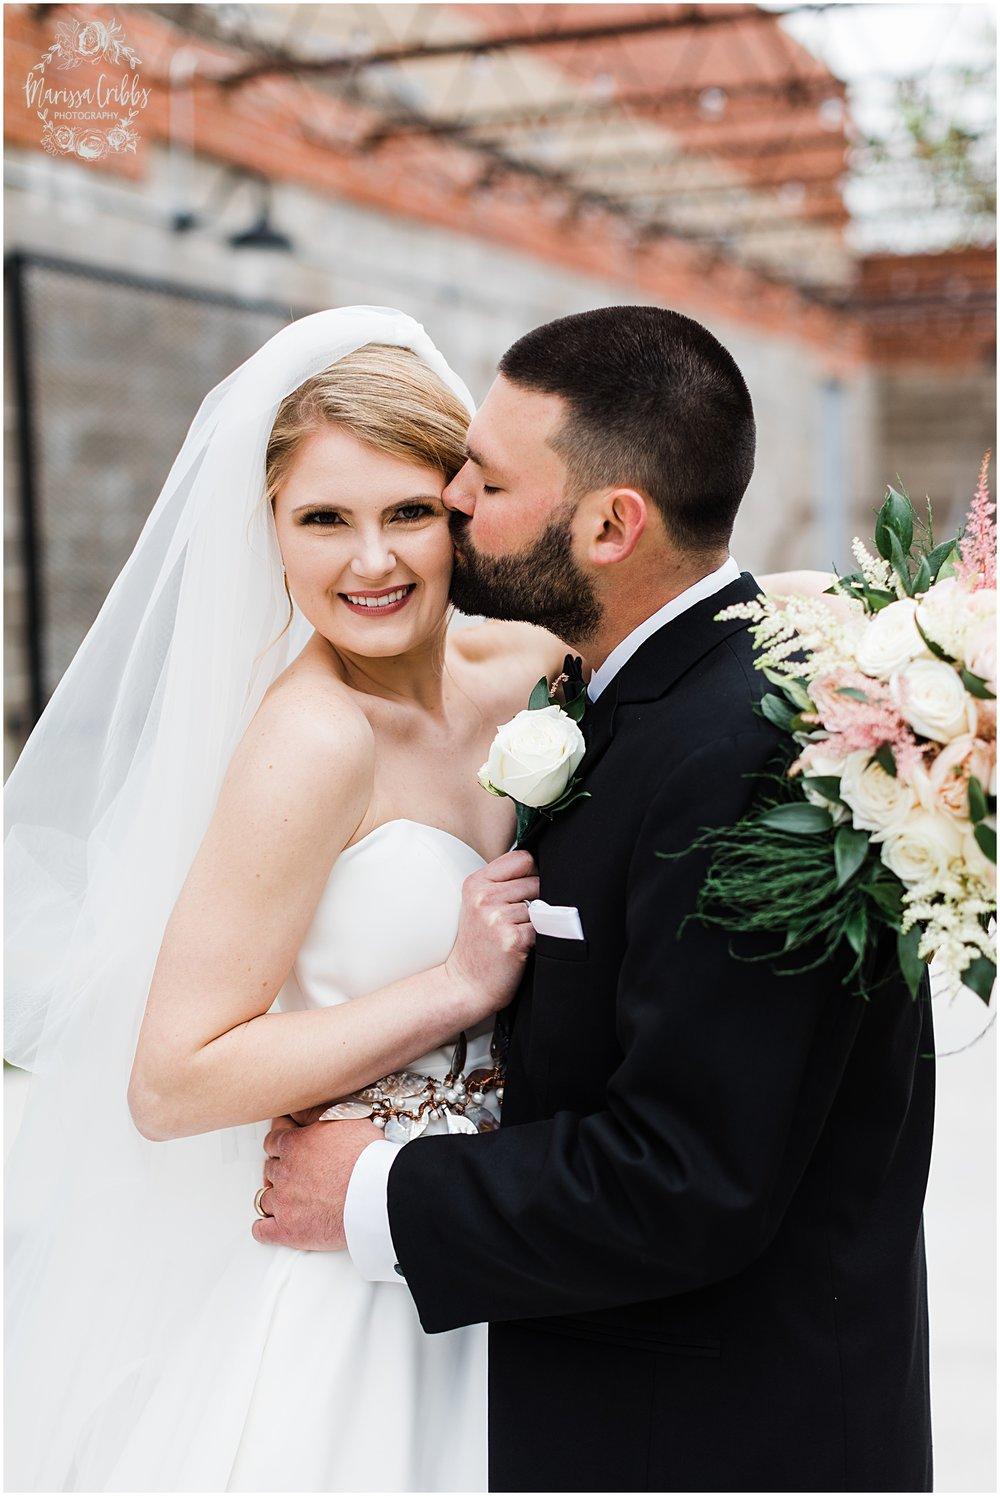 ABBY & CHARLIE WEDDING   THE HUDSON EVENT SPACE WEDDING   MARISSA CRIBBS PHOTOGRAPHY_7518.jpg